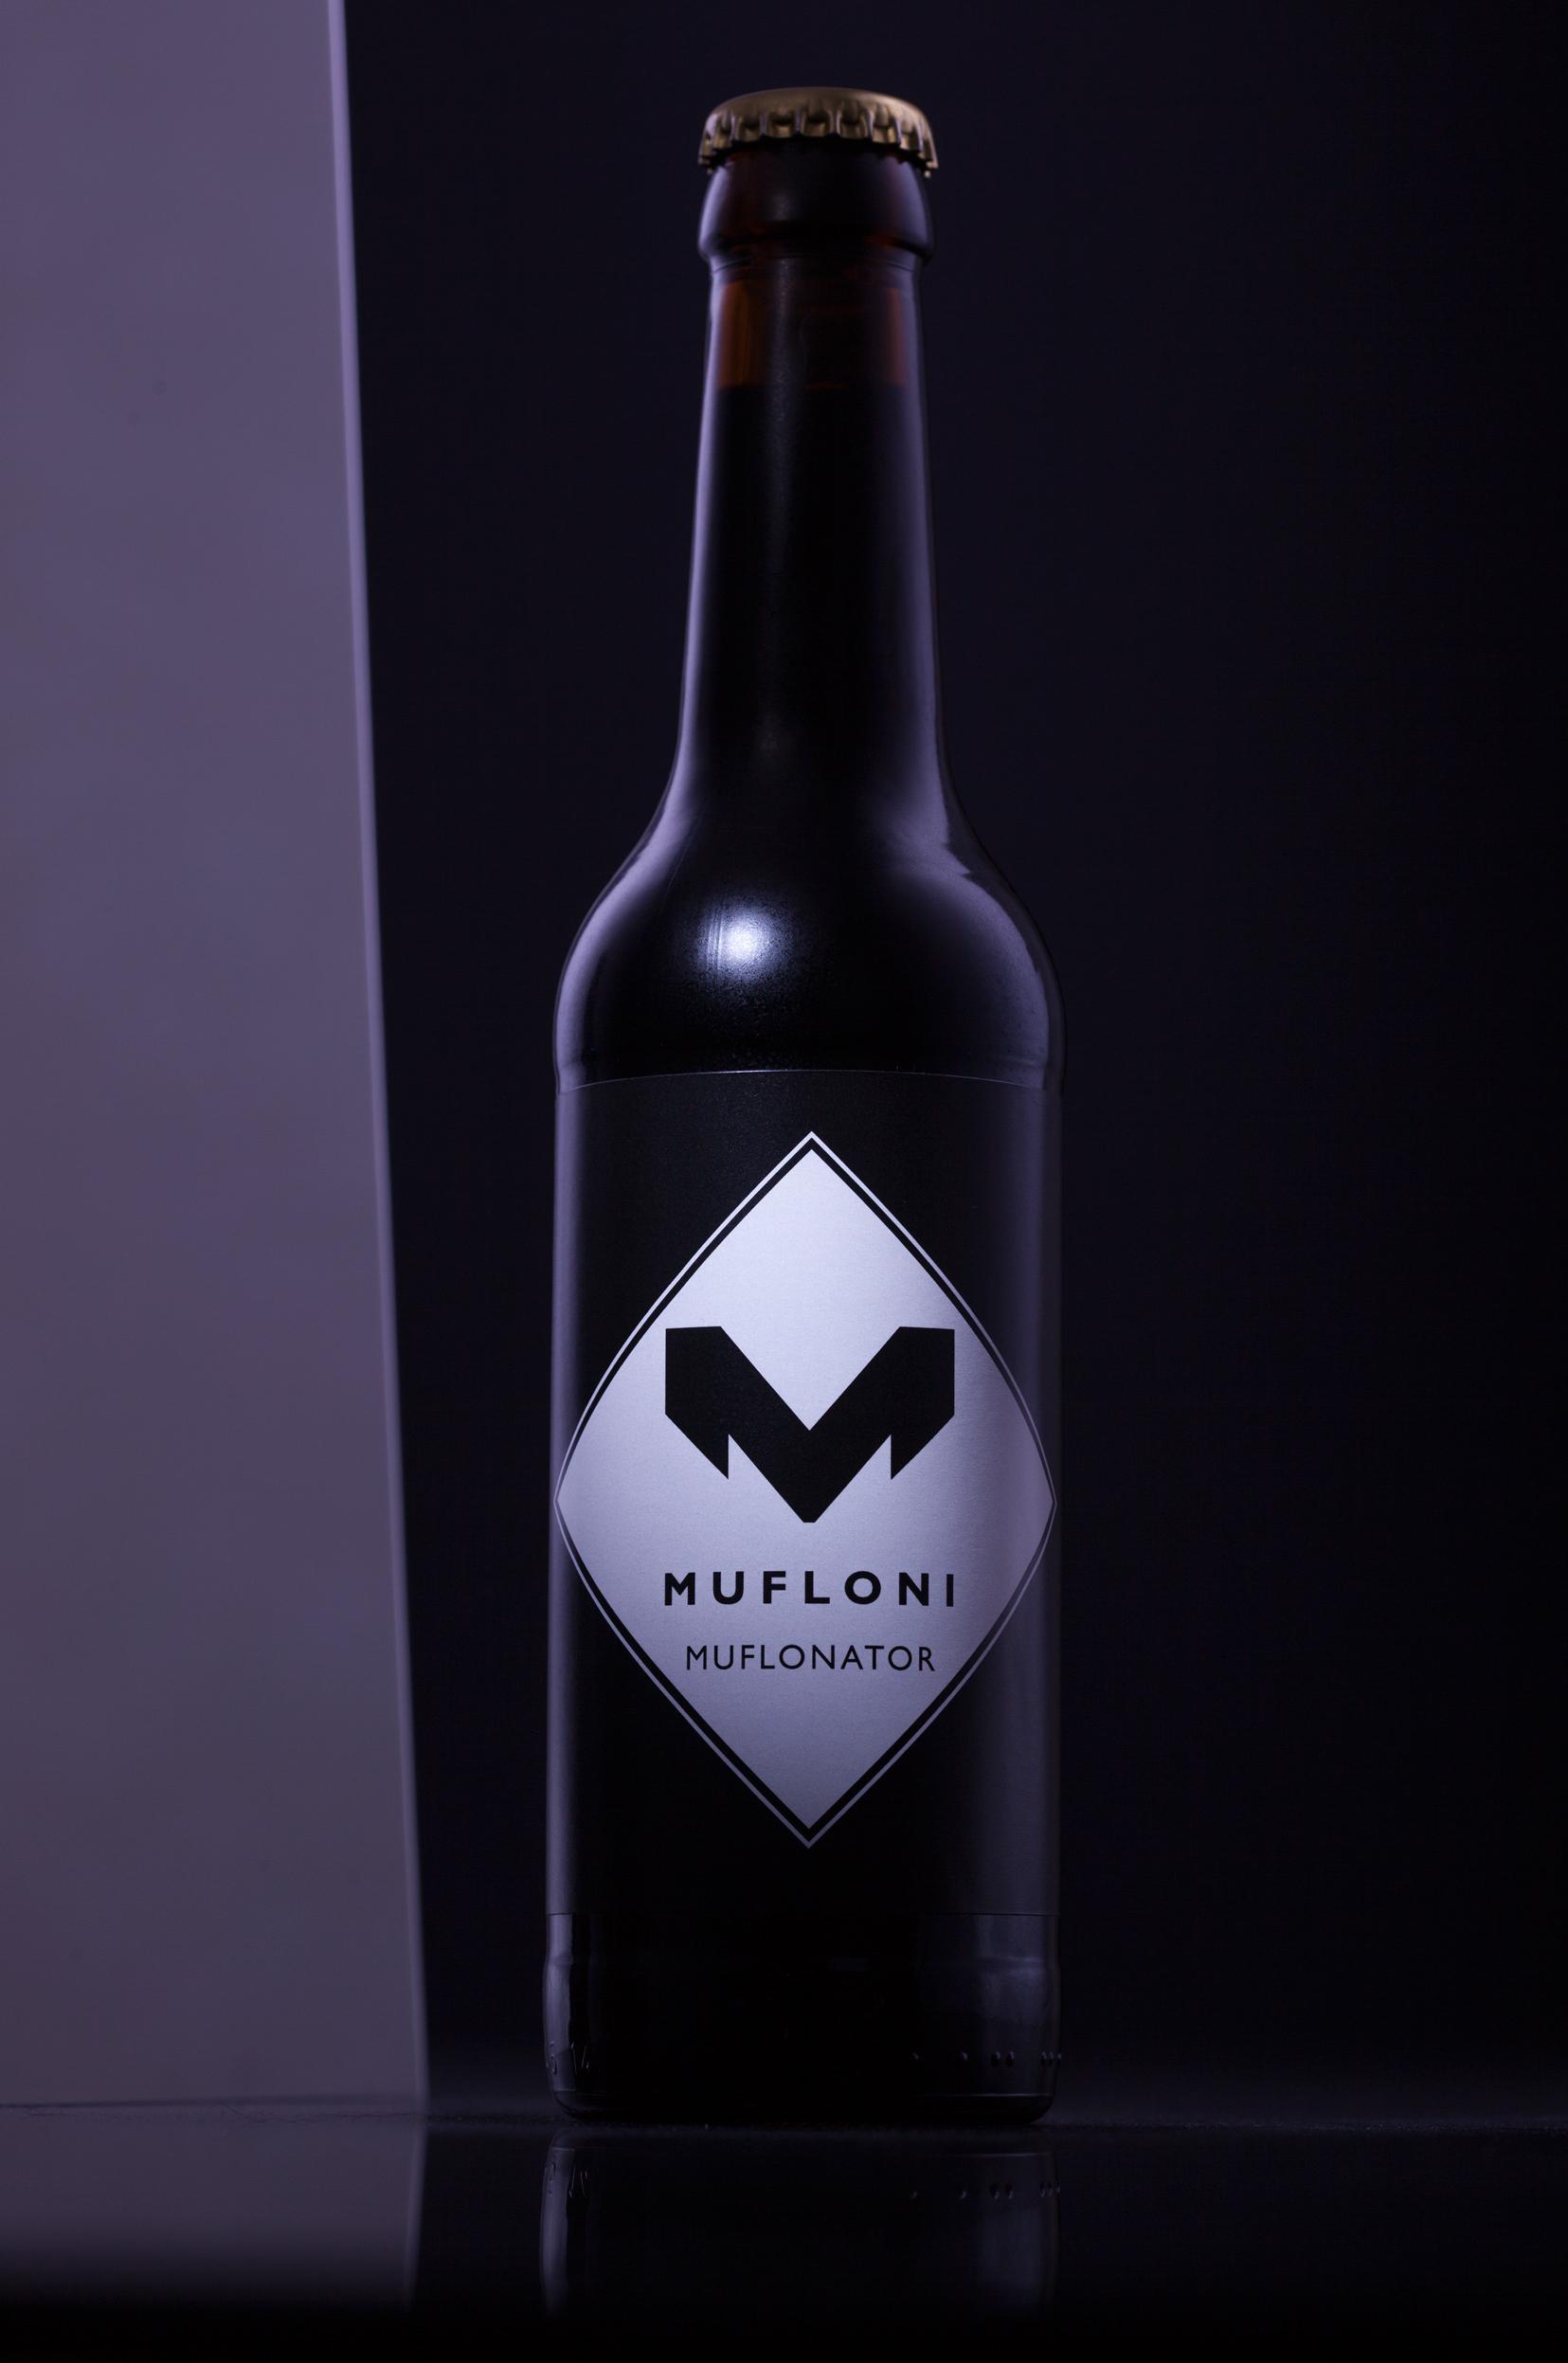 muffloni_before.jpg